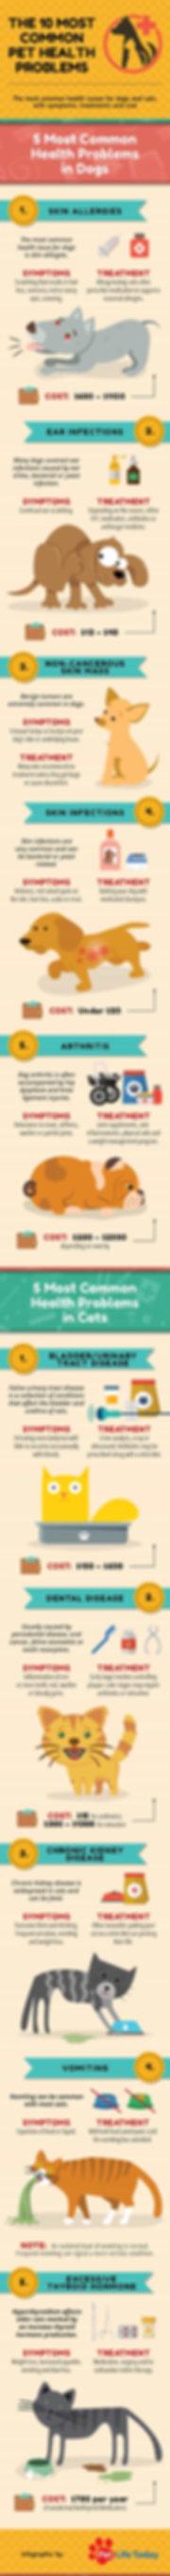 pet-health-problems-infographic.jpg